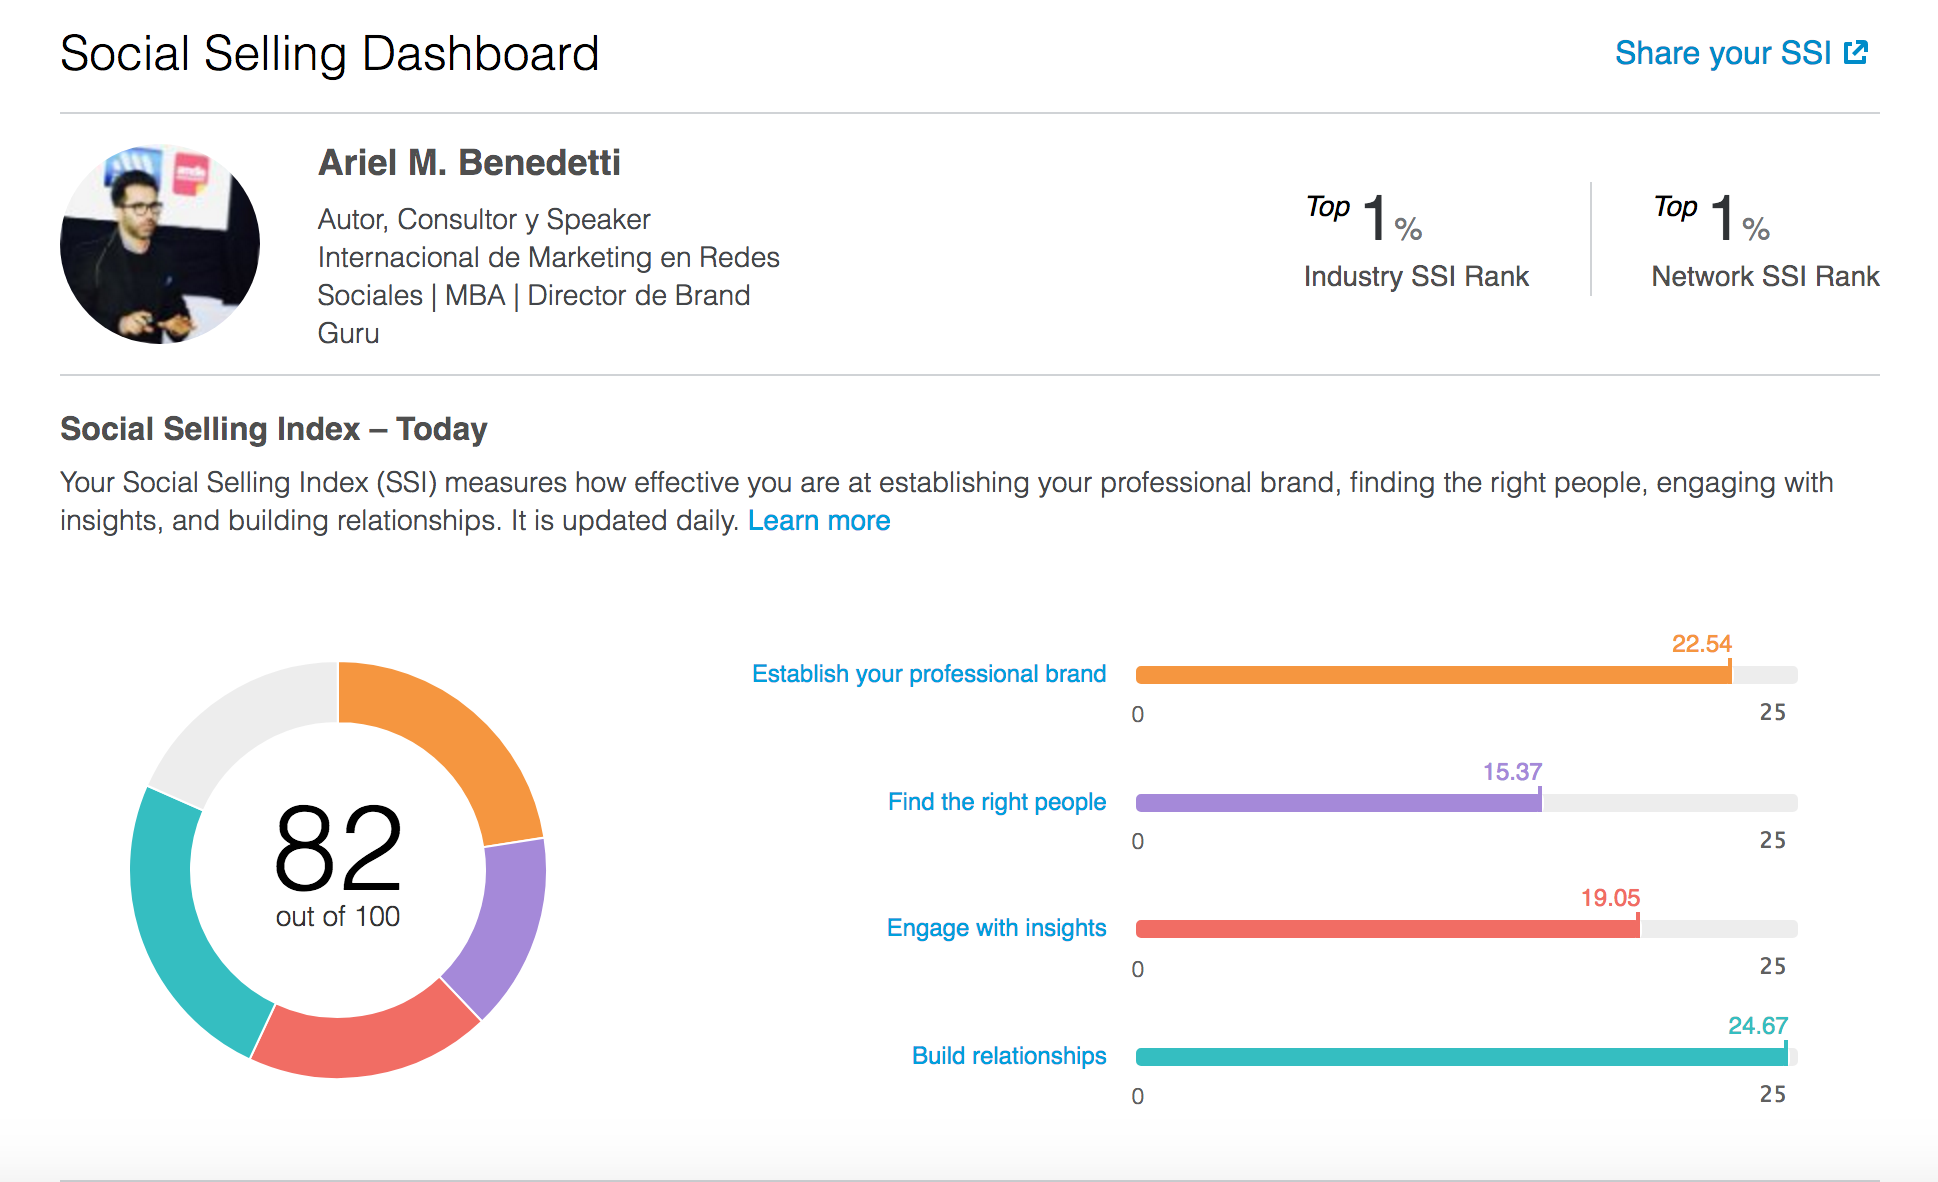 Cómo crear un perfil Pro en LinkedIn. | Ariel M. Benedetti | Autor ...